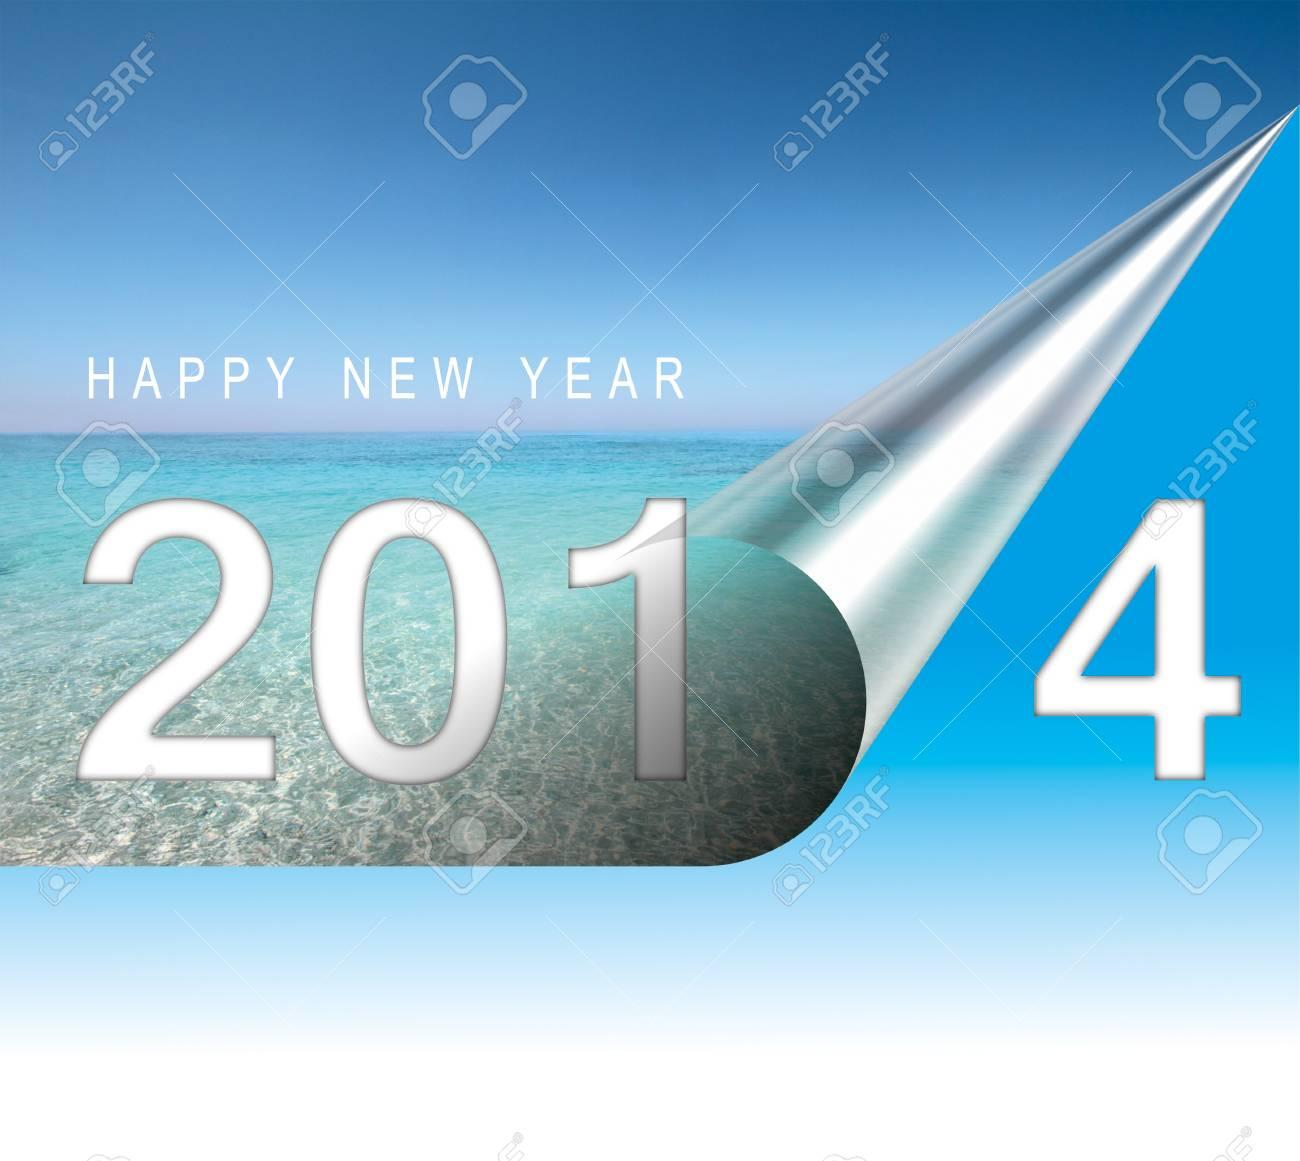 Happy new year card Stock Photo - 17109850